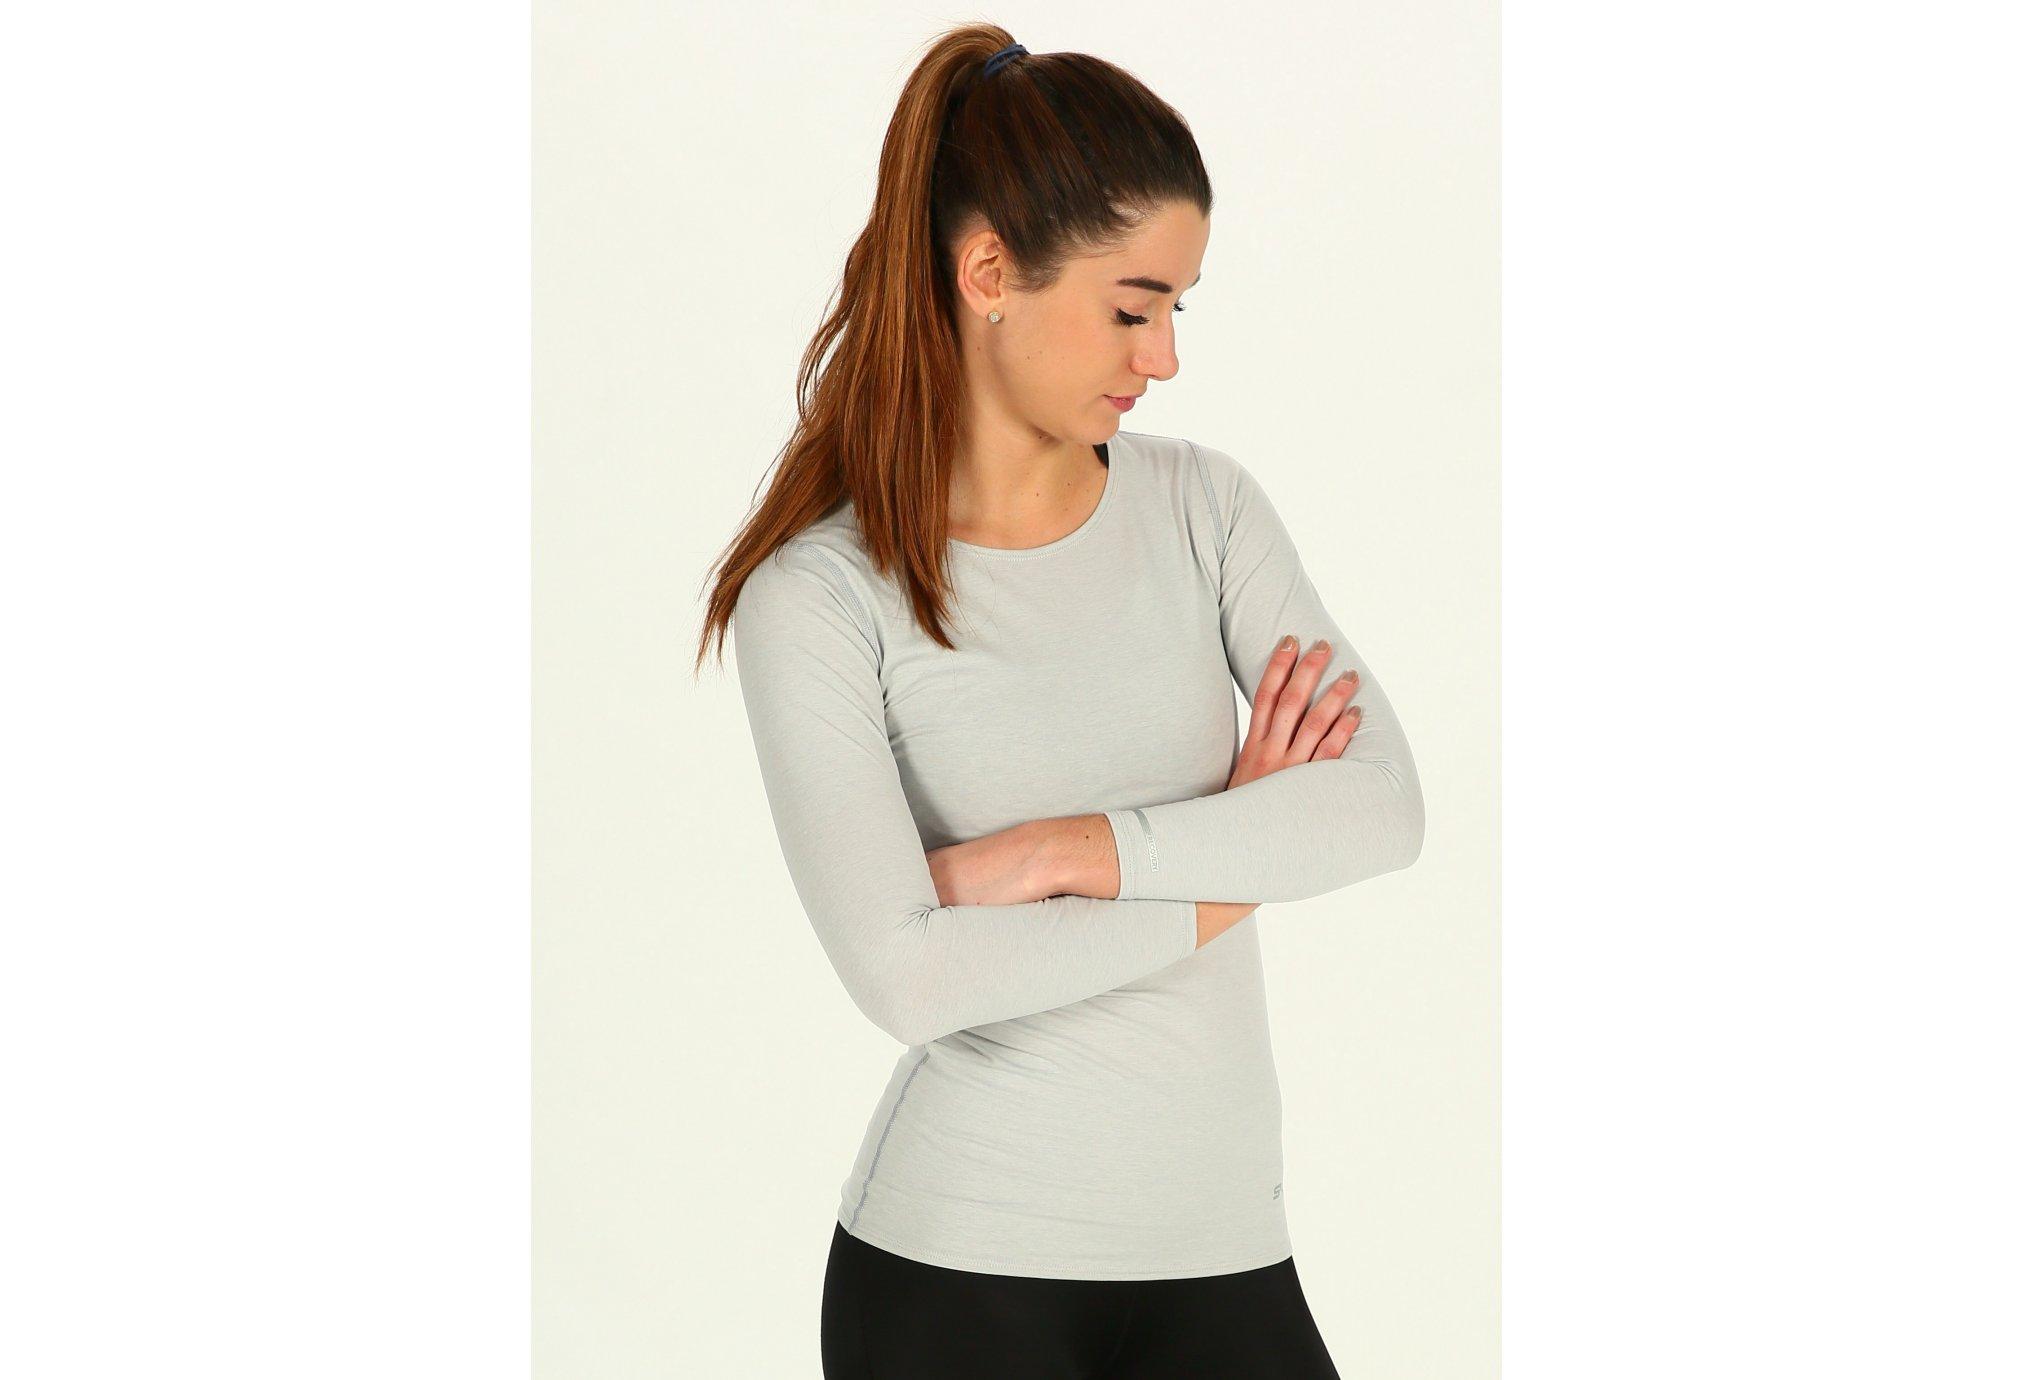 Skins DNAmic Sleep Recovery W vêtement running femme